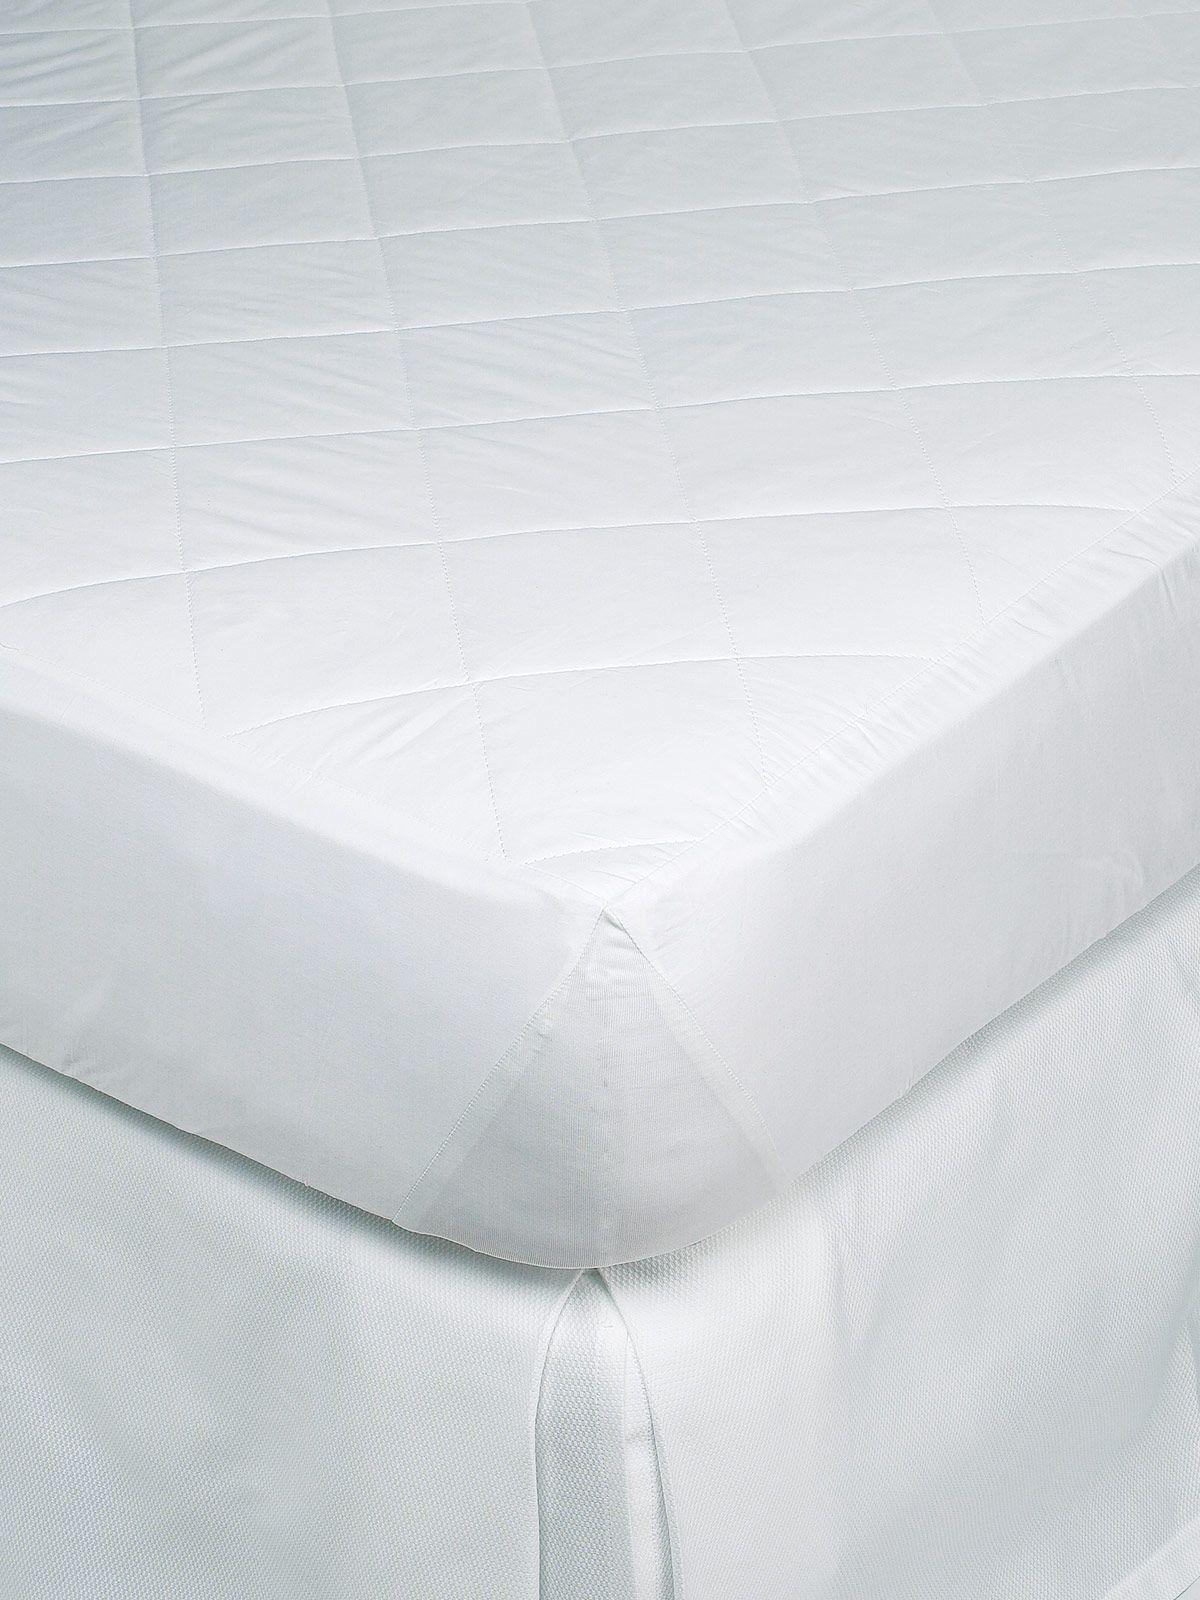 Cotton Mattress Pads Luxury Bedding Italian Bed Linens Schweitzer Linen In 2021 Cotton Mattress Mattress Pads Mattress All cotton mattress pad no polyester